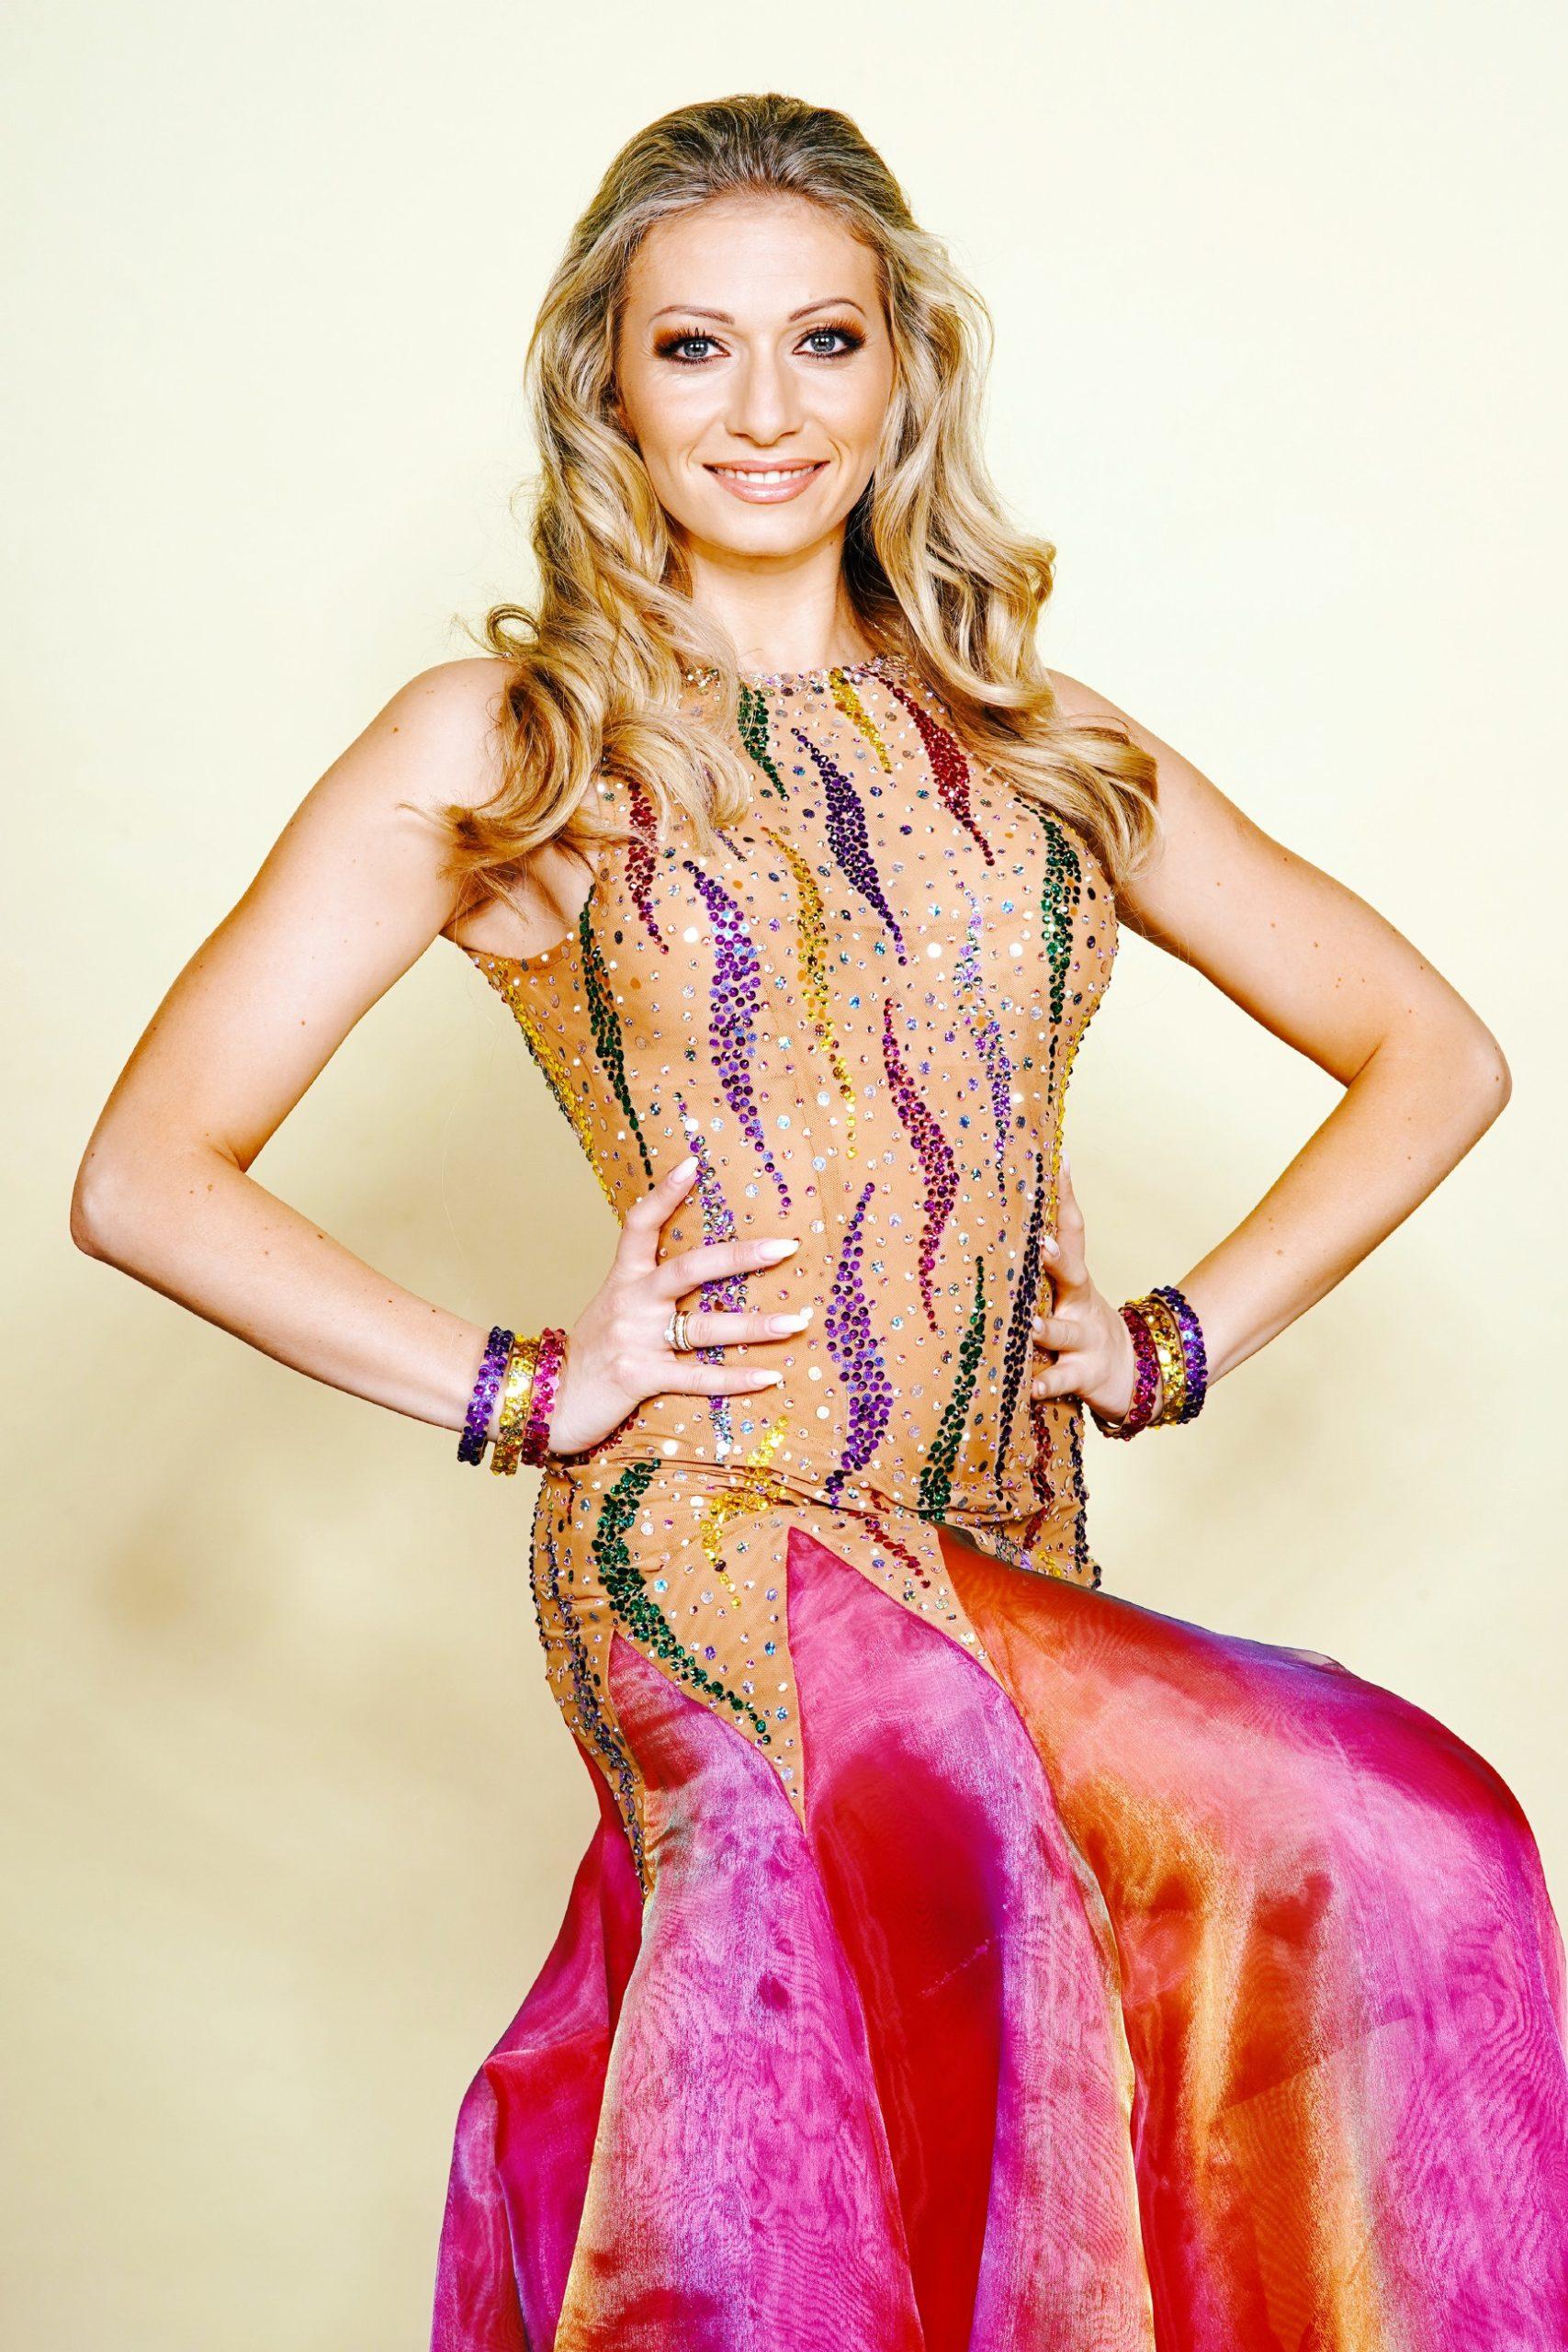 Let's Dance 2020 - Profitänzerin Renata Lusin